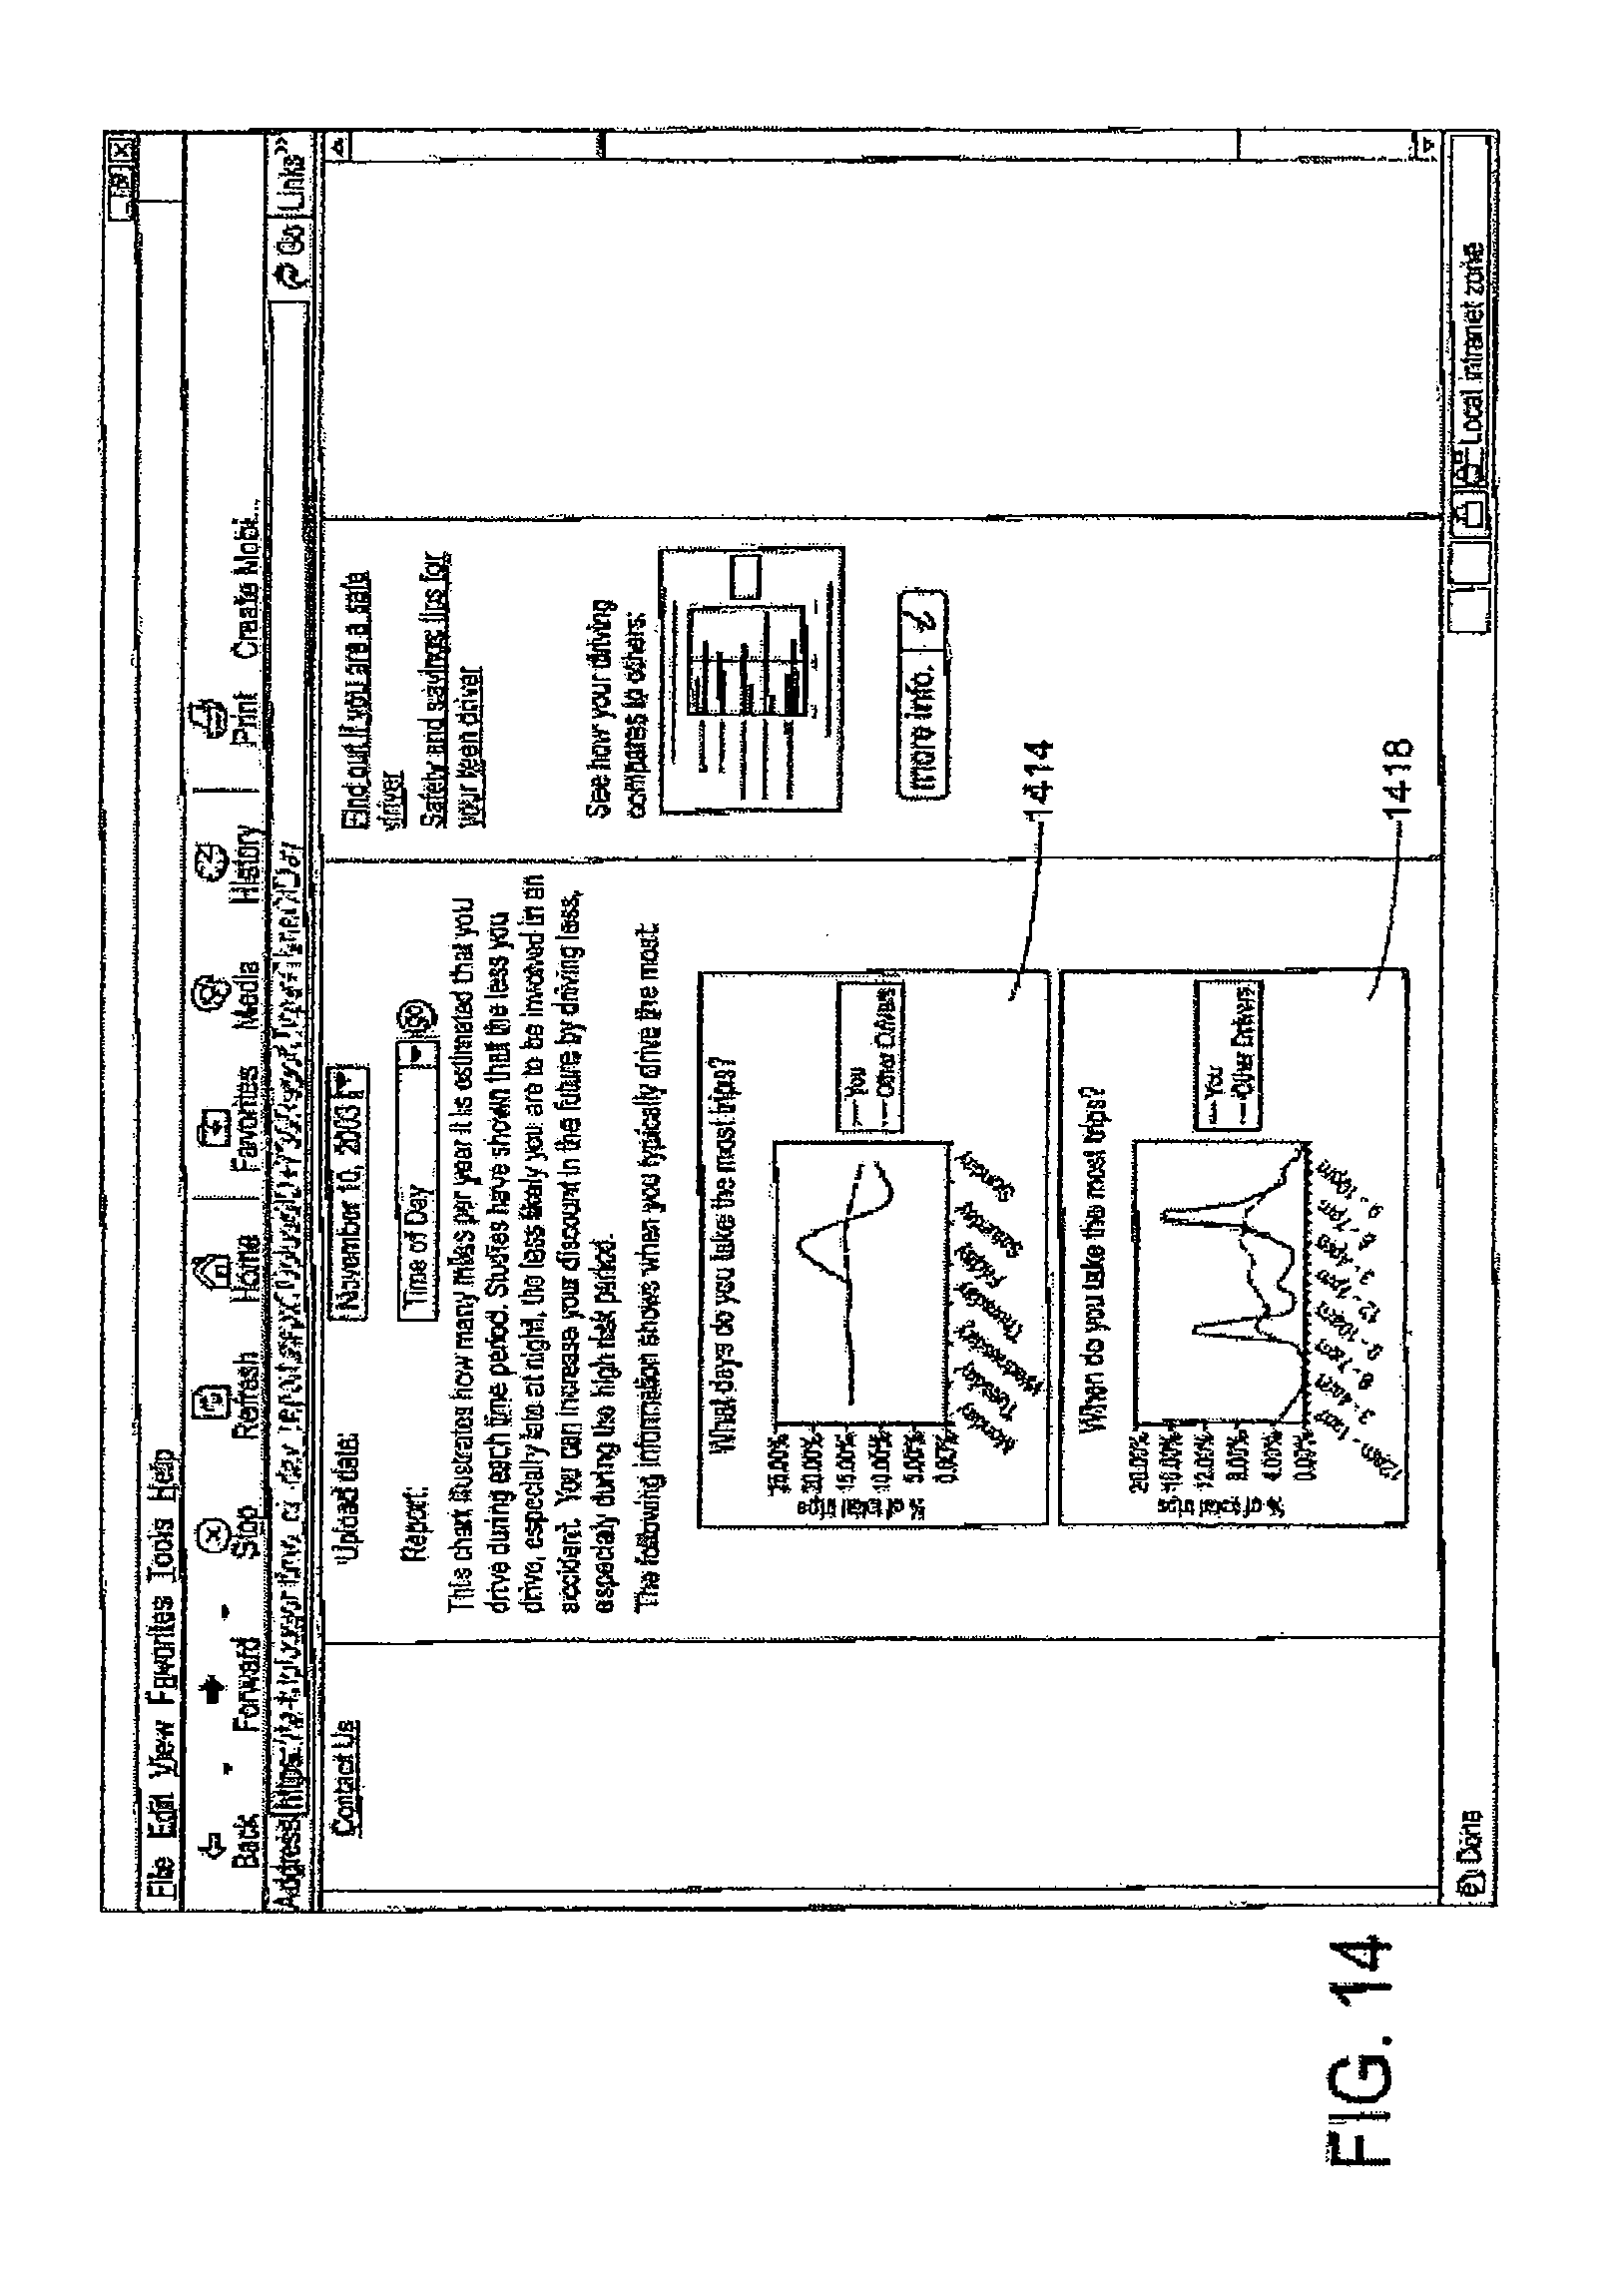 Patent Us 8311858 B2 Meters By Meter Mate Electrical Prepaid House Flow Diagram Images